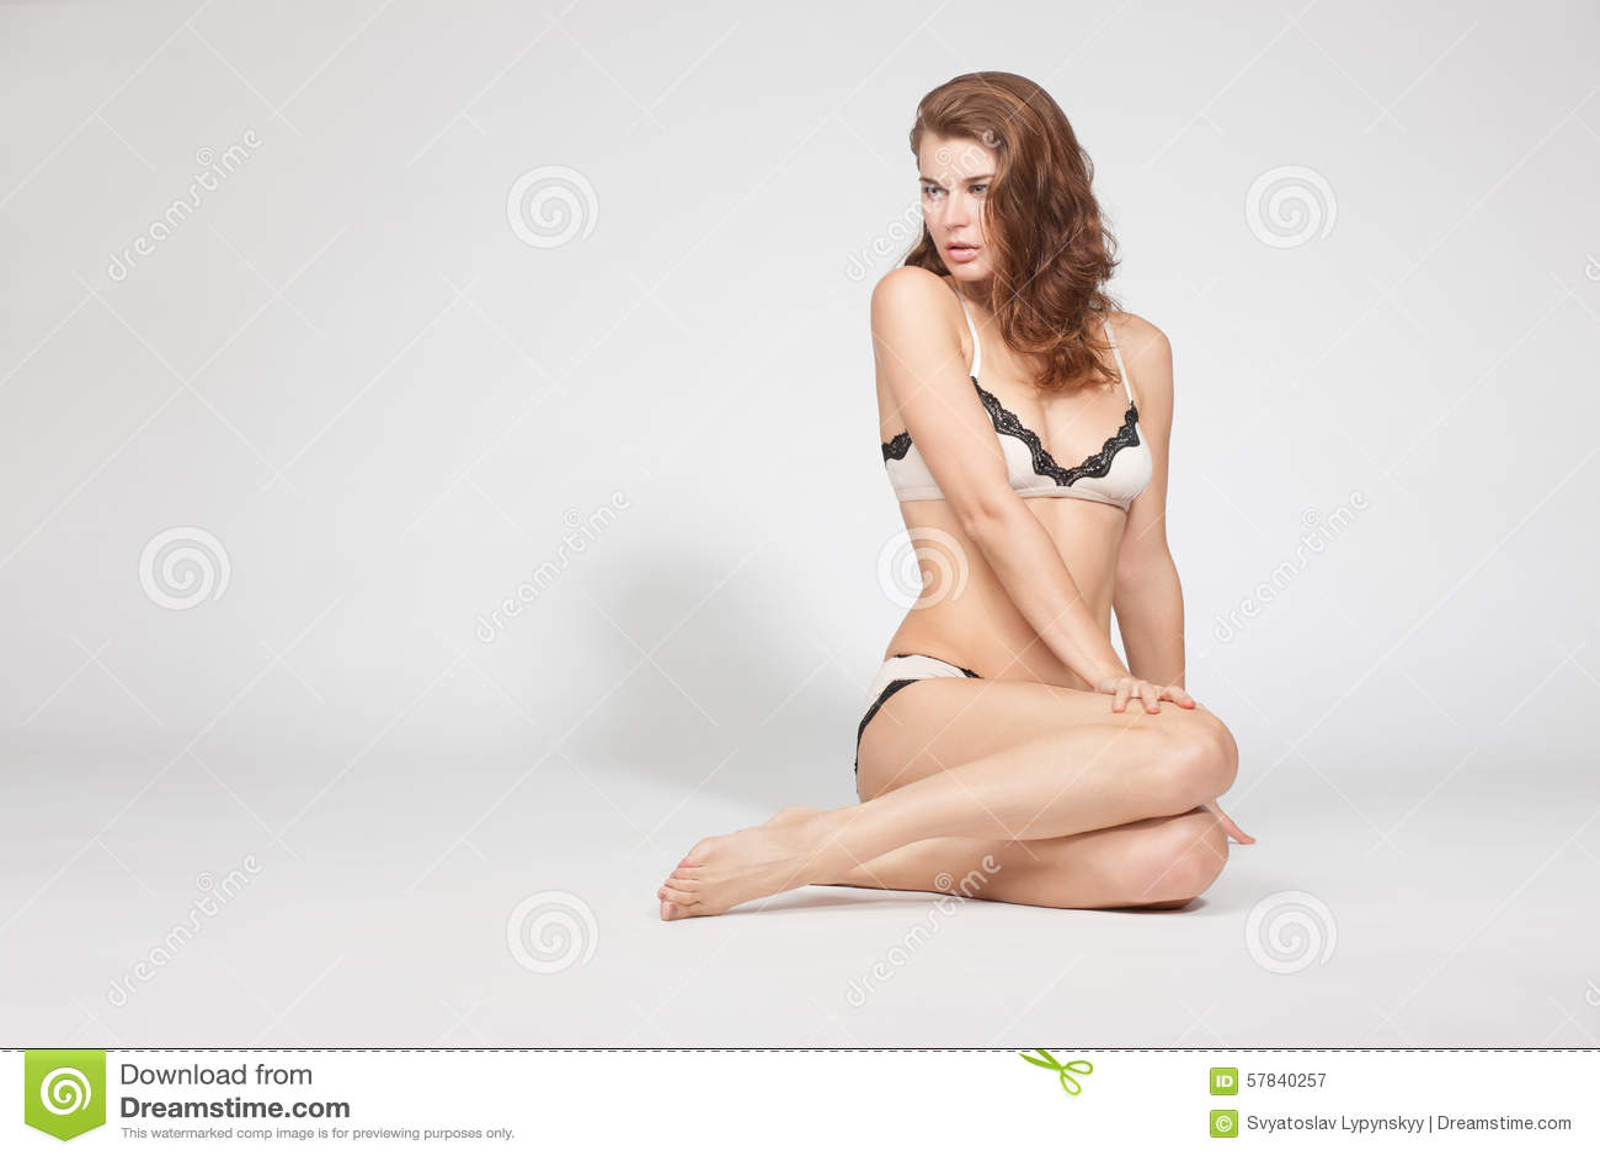 9da6f9f7bcfb Portrait of slim and slender woman model in bikini. Pretty woman in white underwear  sitting on the floor, studio shot.